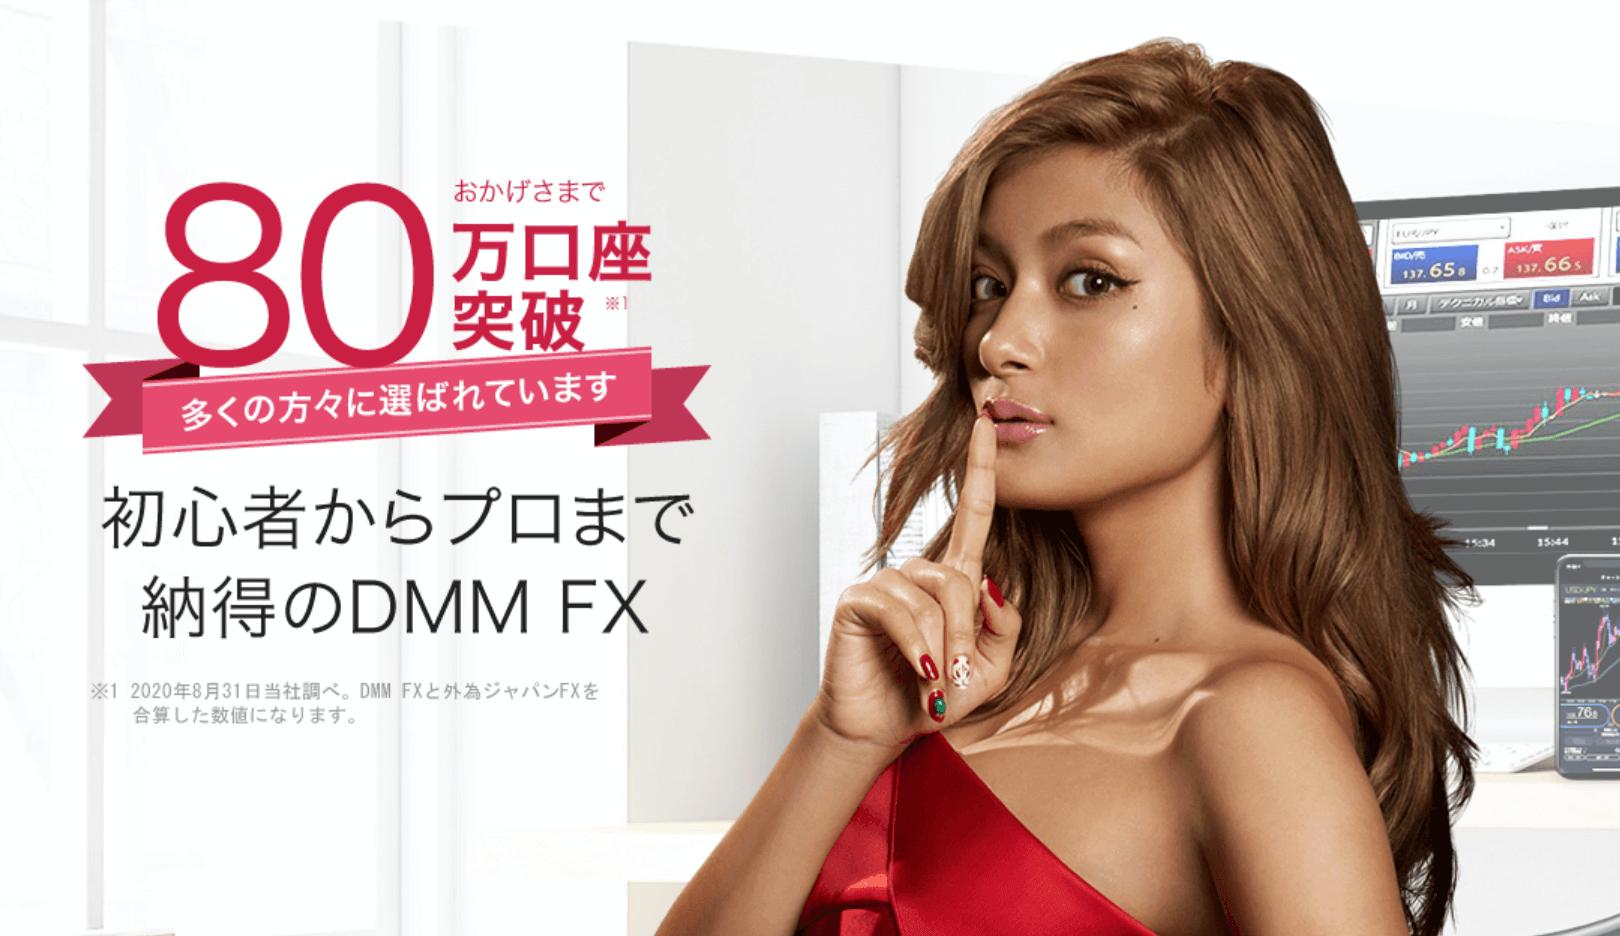 DMM FXの公式ページ